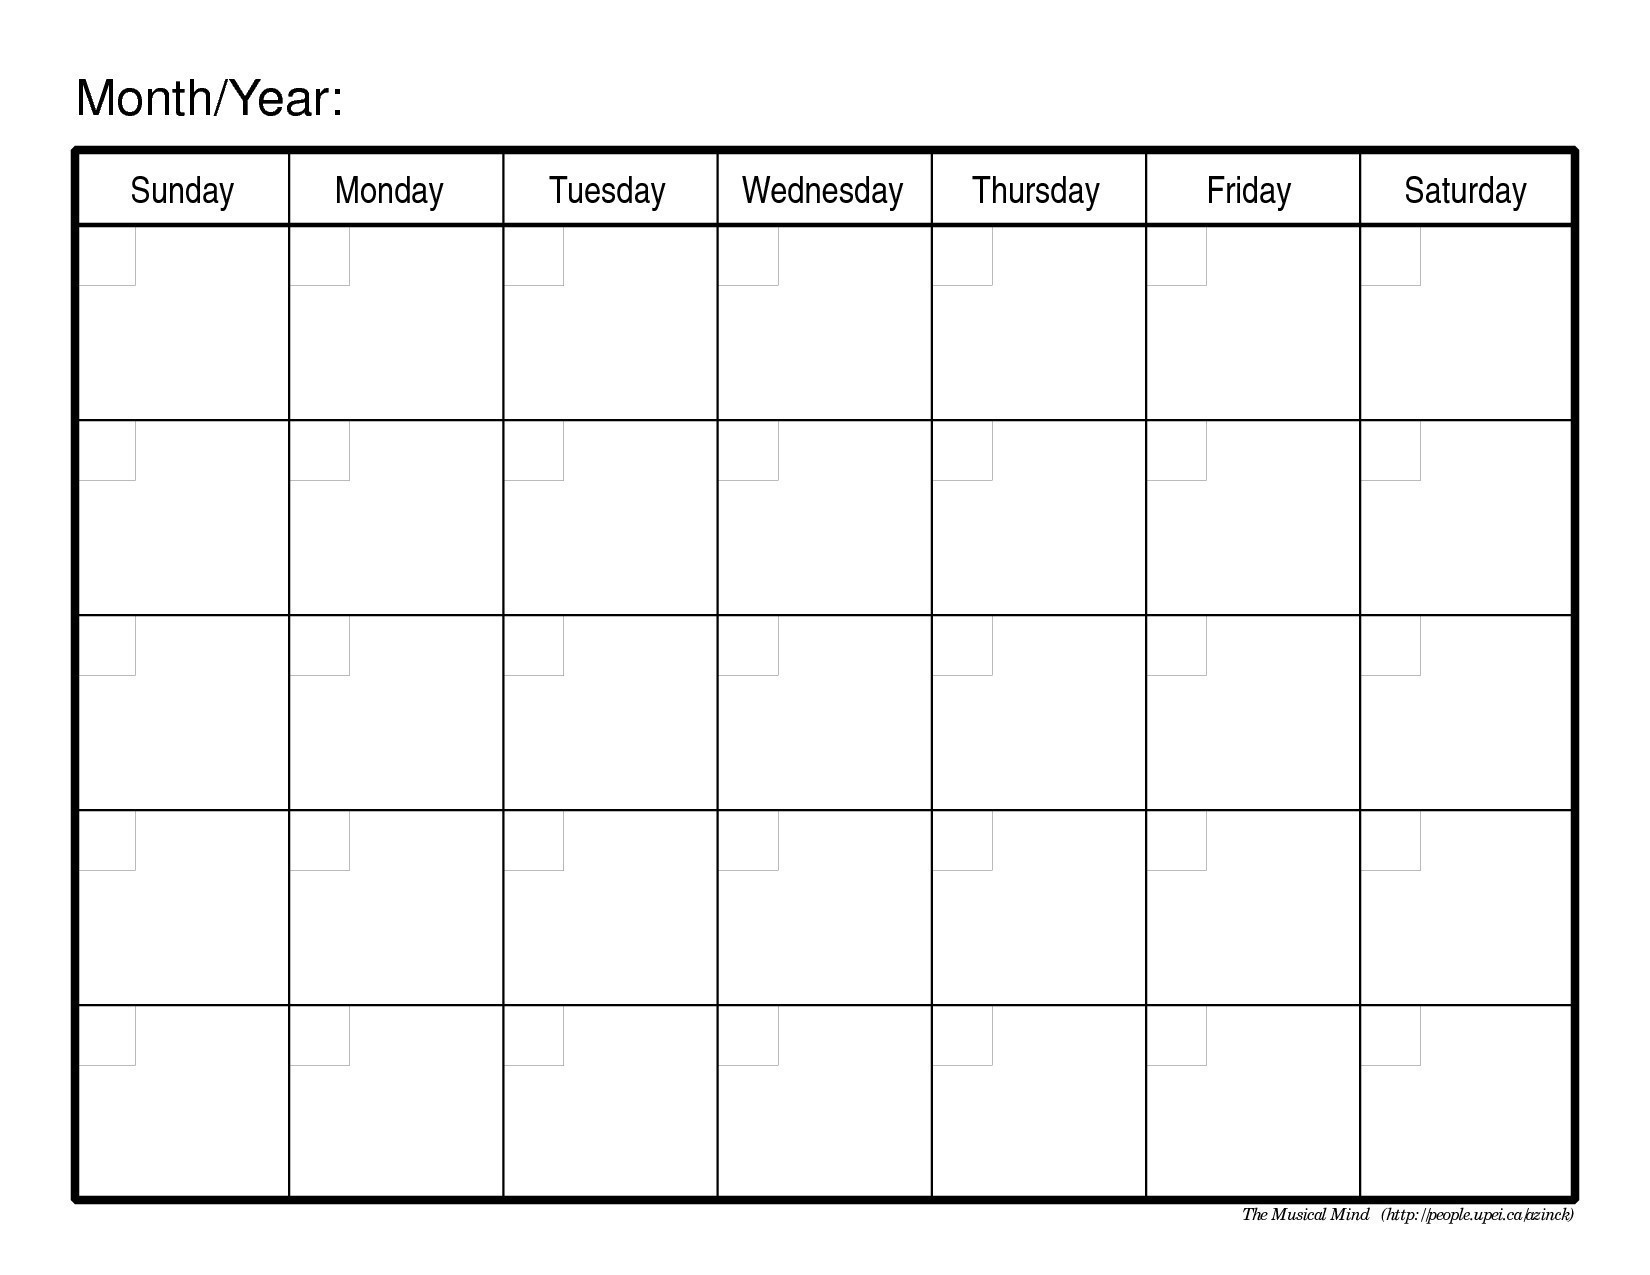 calendario para imprimir septiembre 2017 gratis mas recientes noticias calendario para imprimir 2017 excel of calendario para imprimir septiembre 2017 gratis